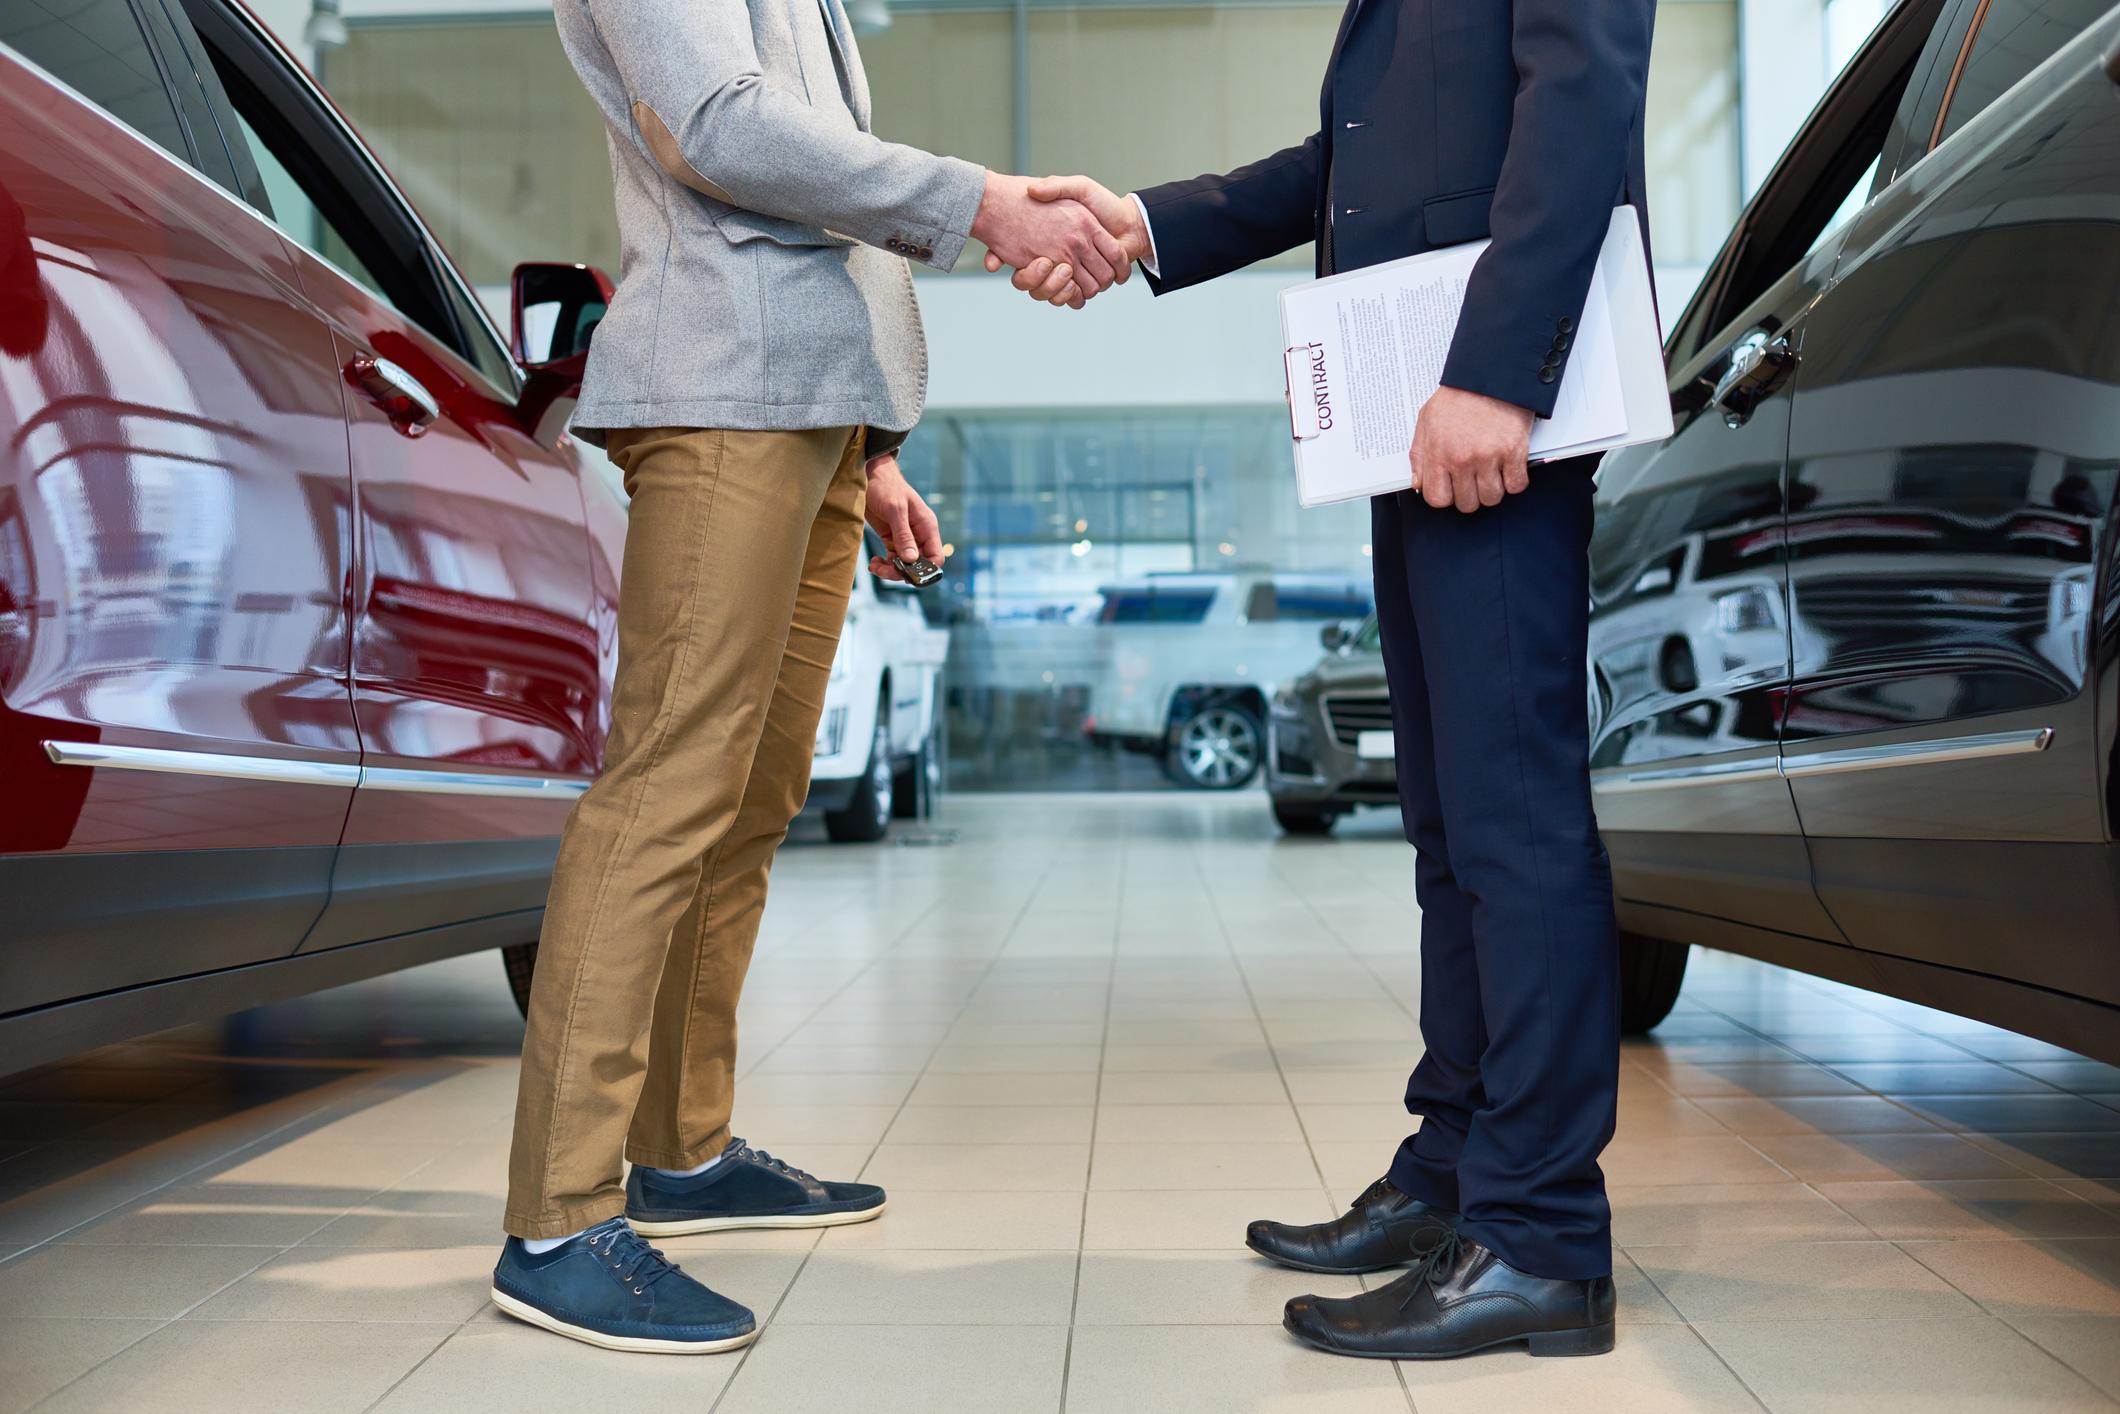 Customer and salesman shake hands inside a car dealership